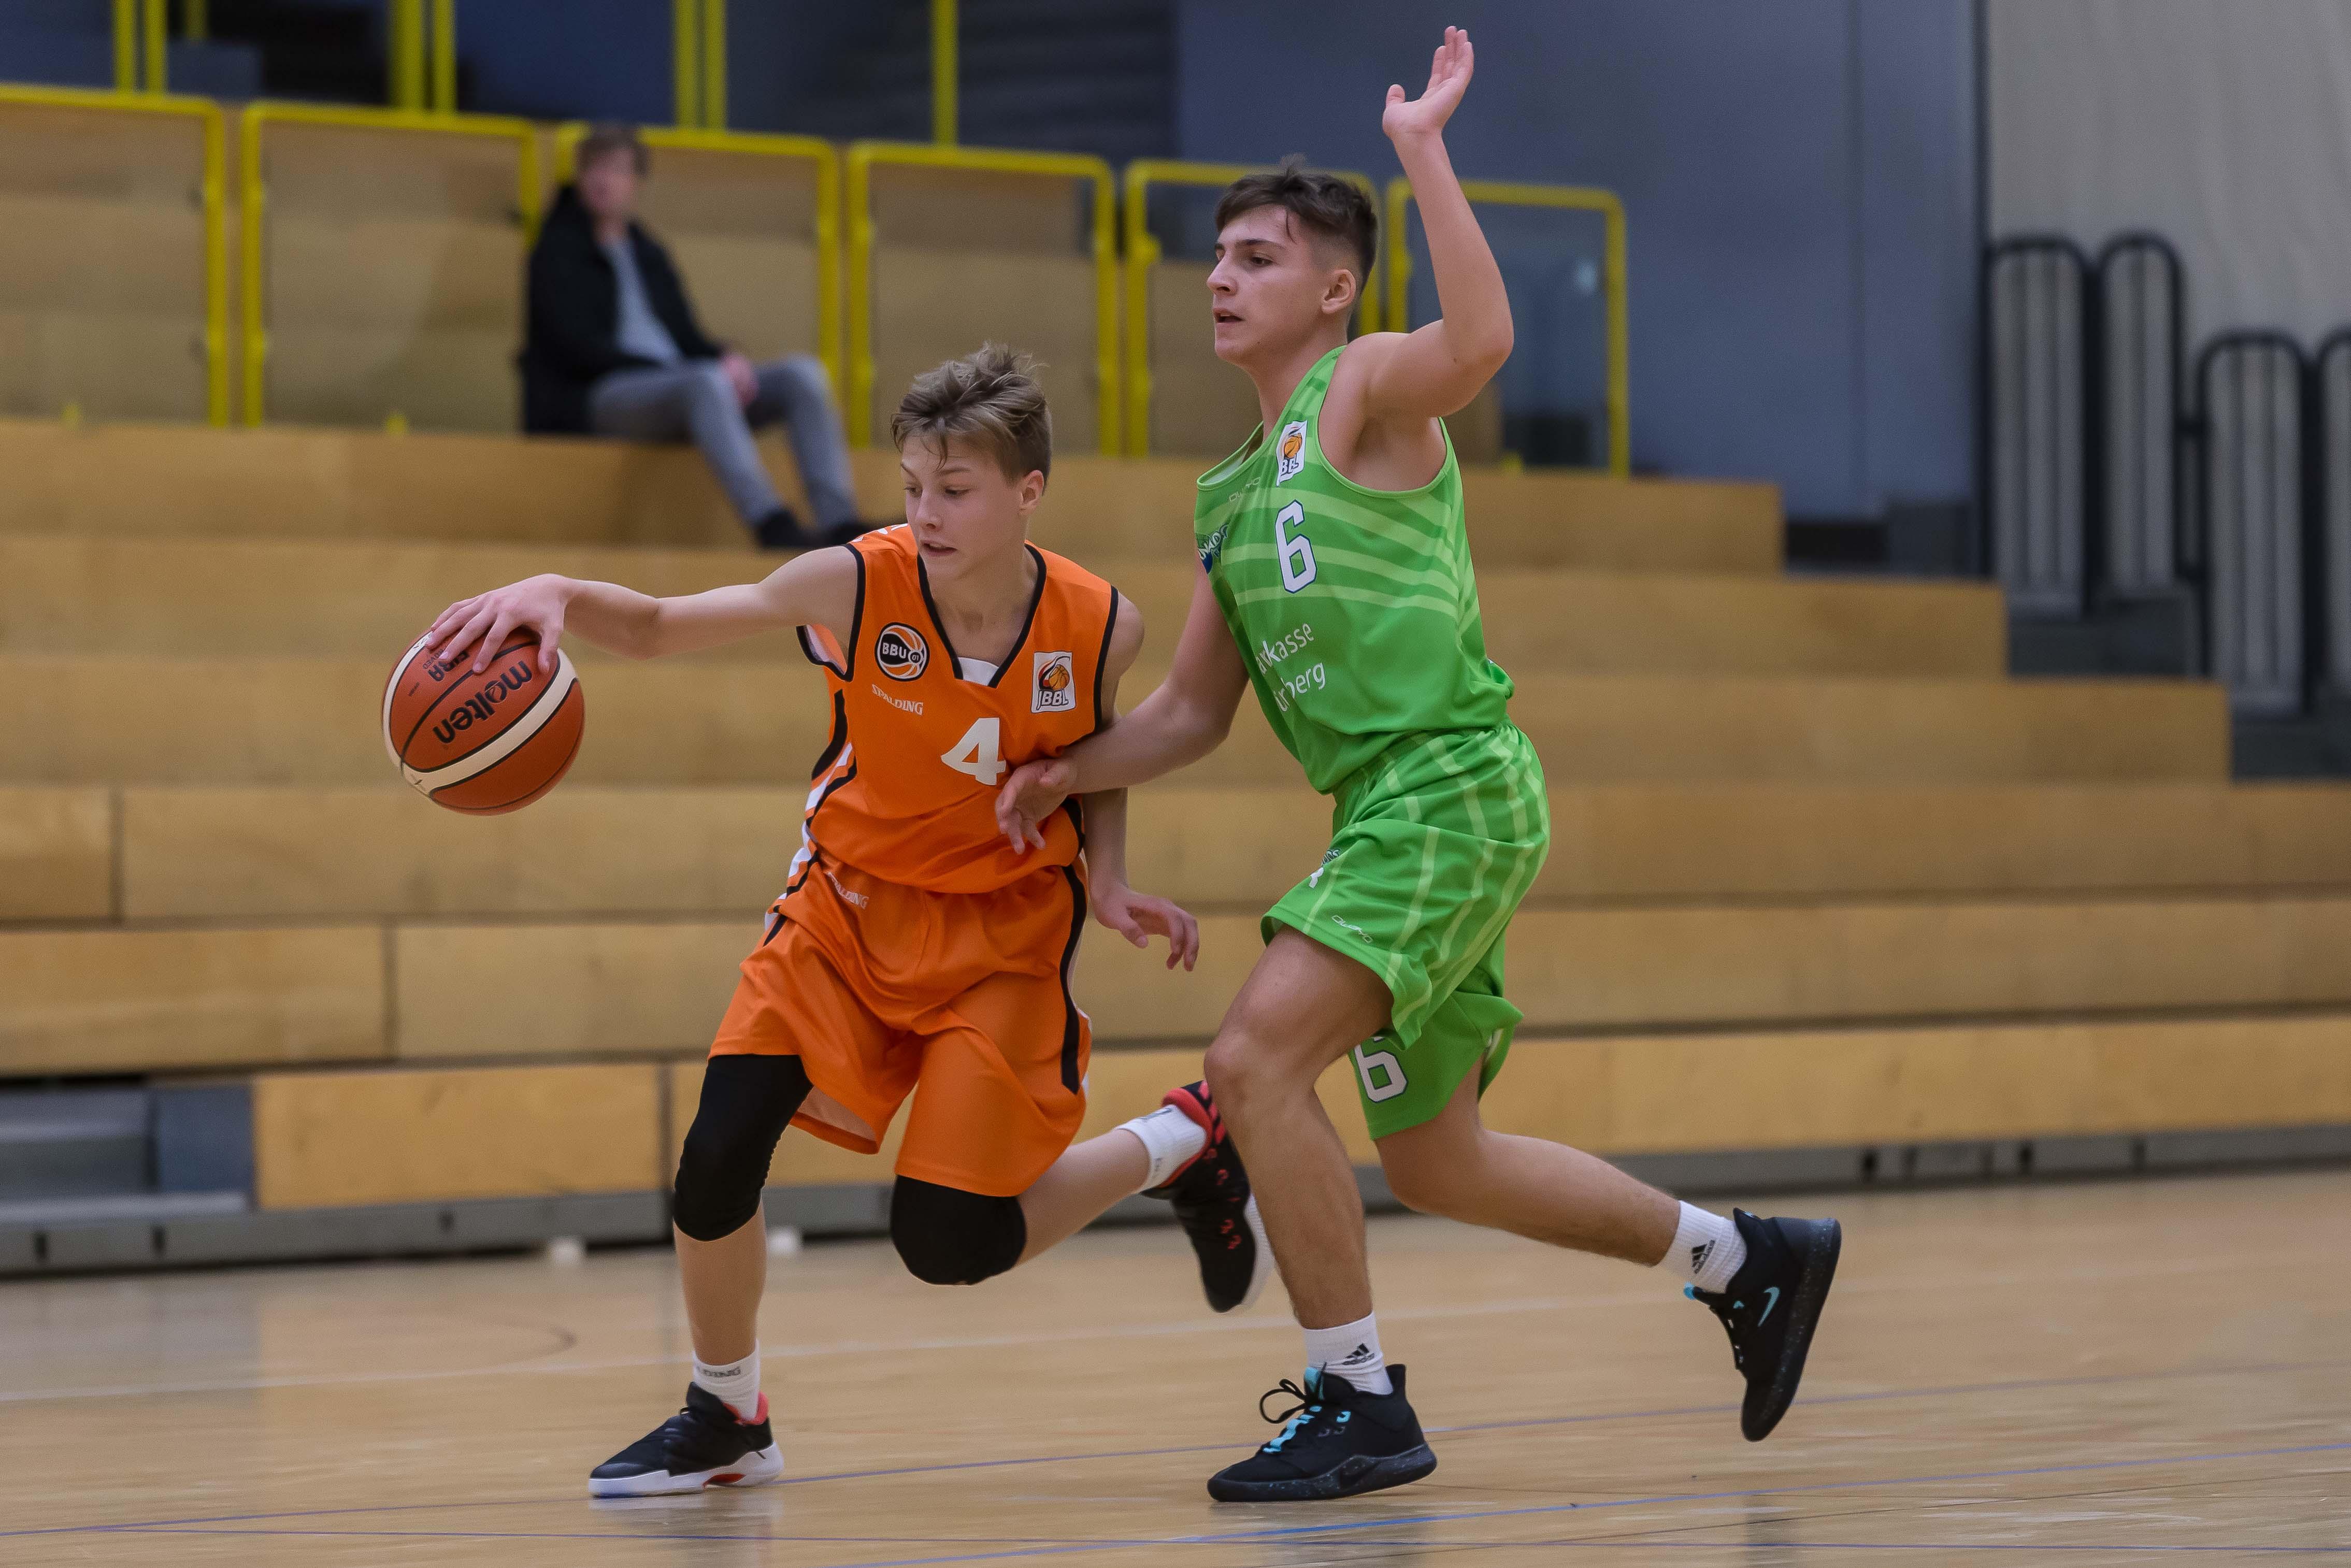 JBBL_19-20_OrangeAcademy_TORNADOS-FRANKEN_Spieltag2_Joel-Cwik-2